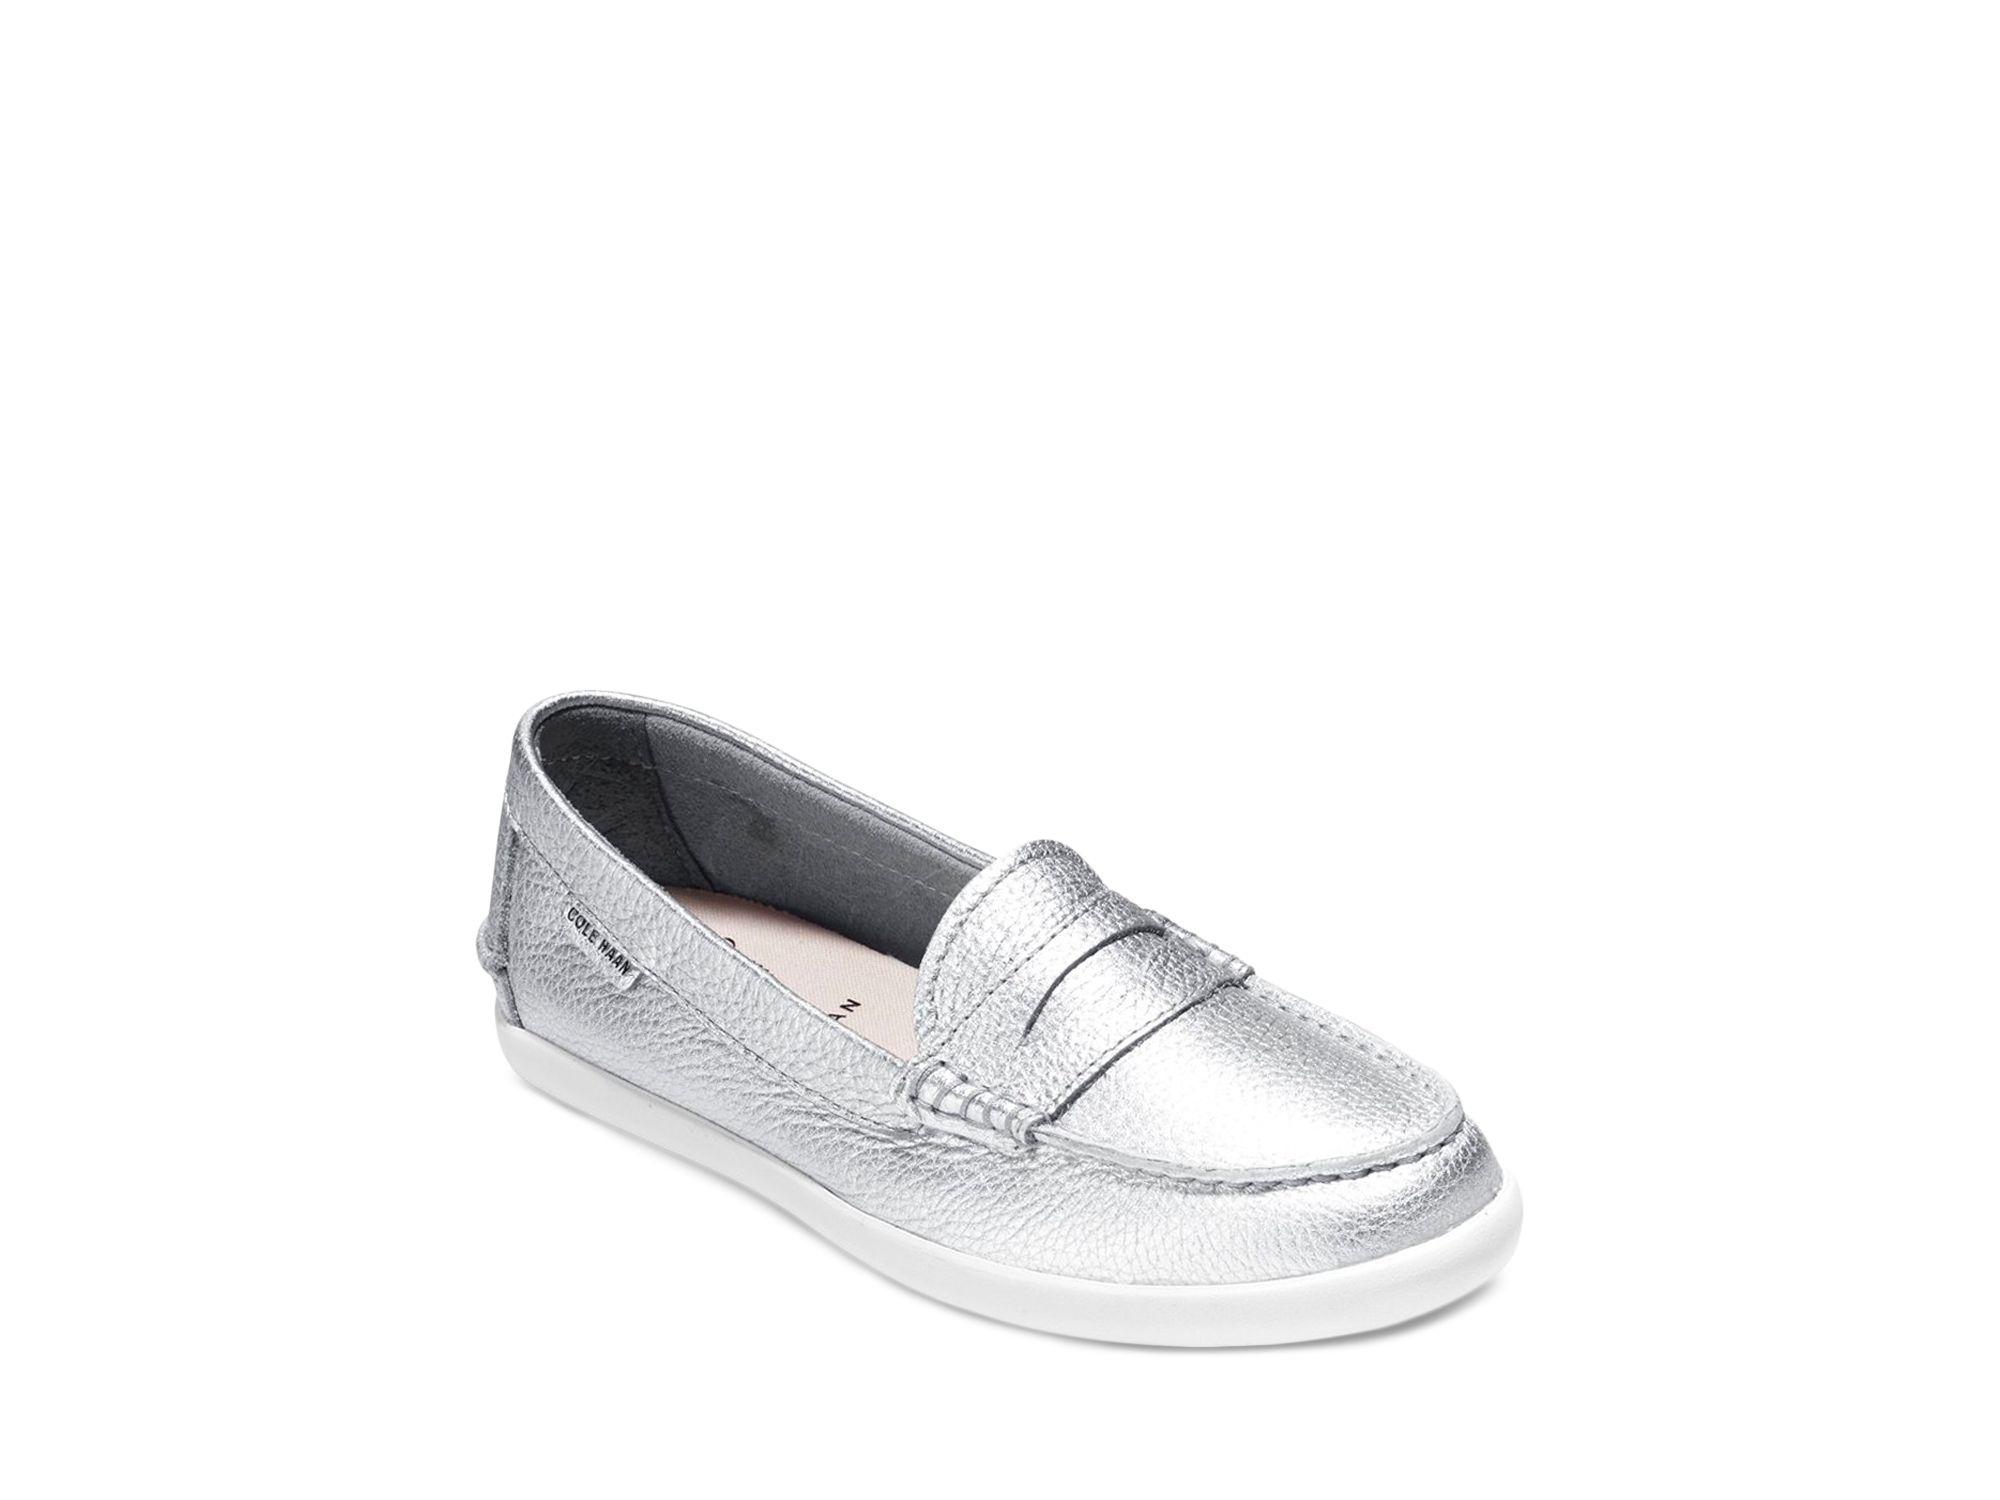 4a1b7dfa8c9 Cole Haan Loafer Flats - Pinch Weekender Metallic in Metallic - Lyst